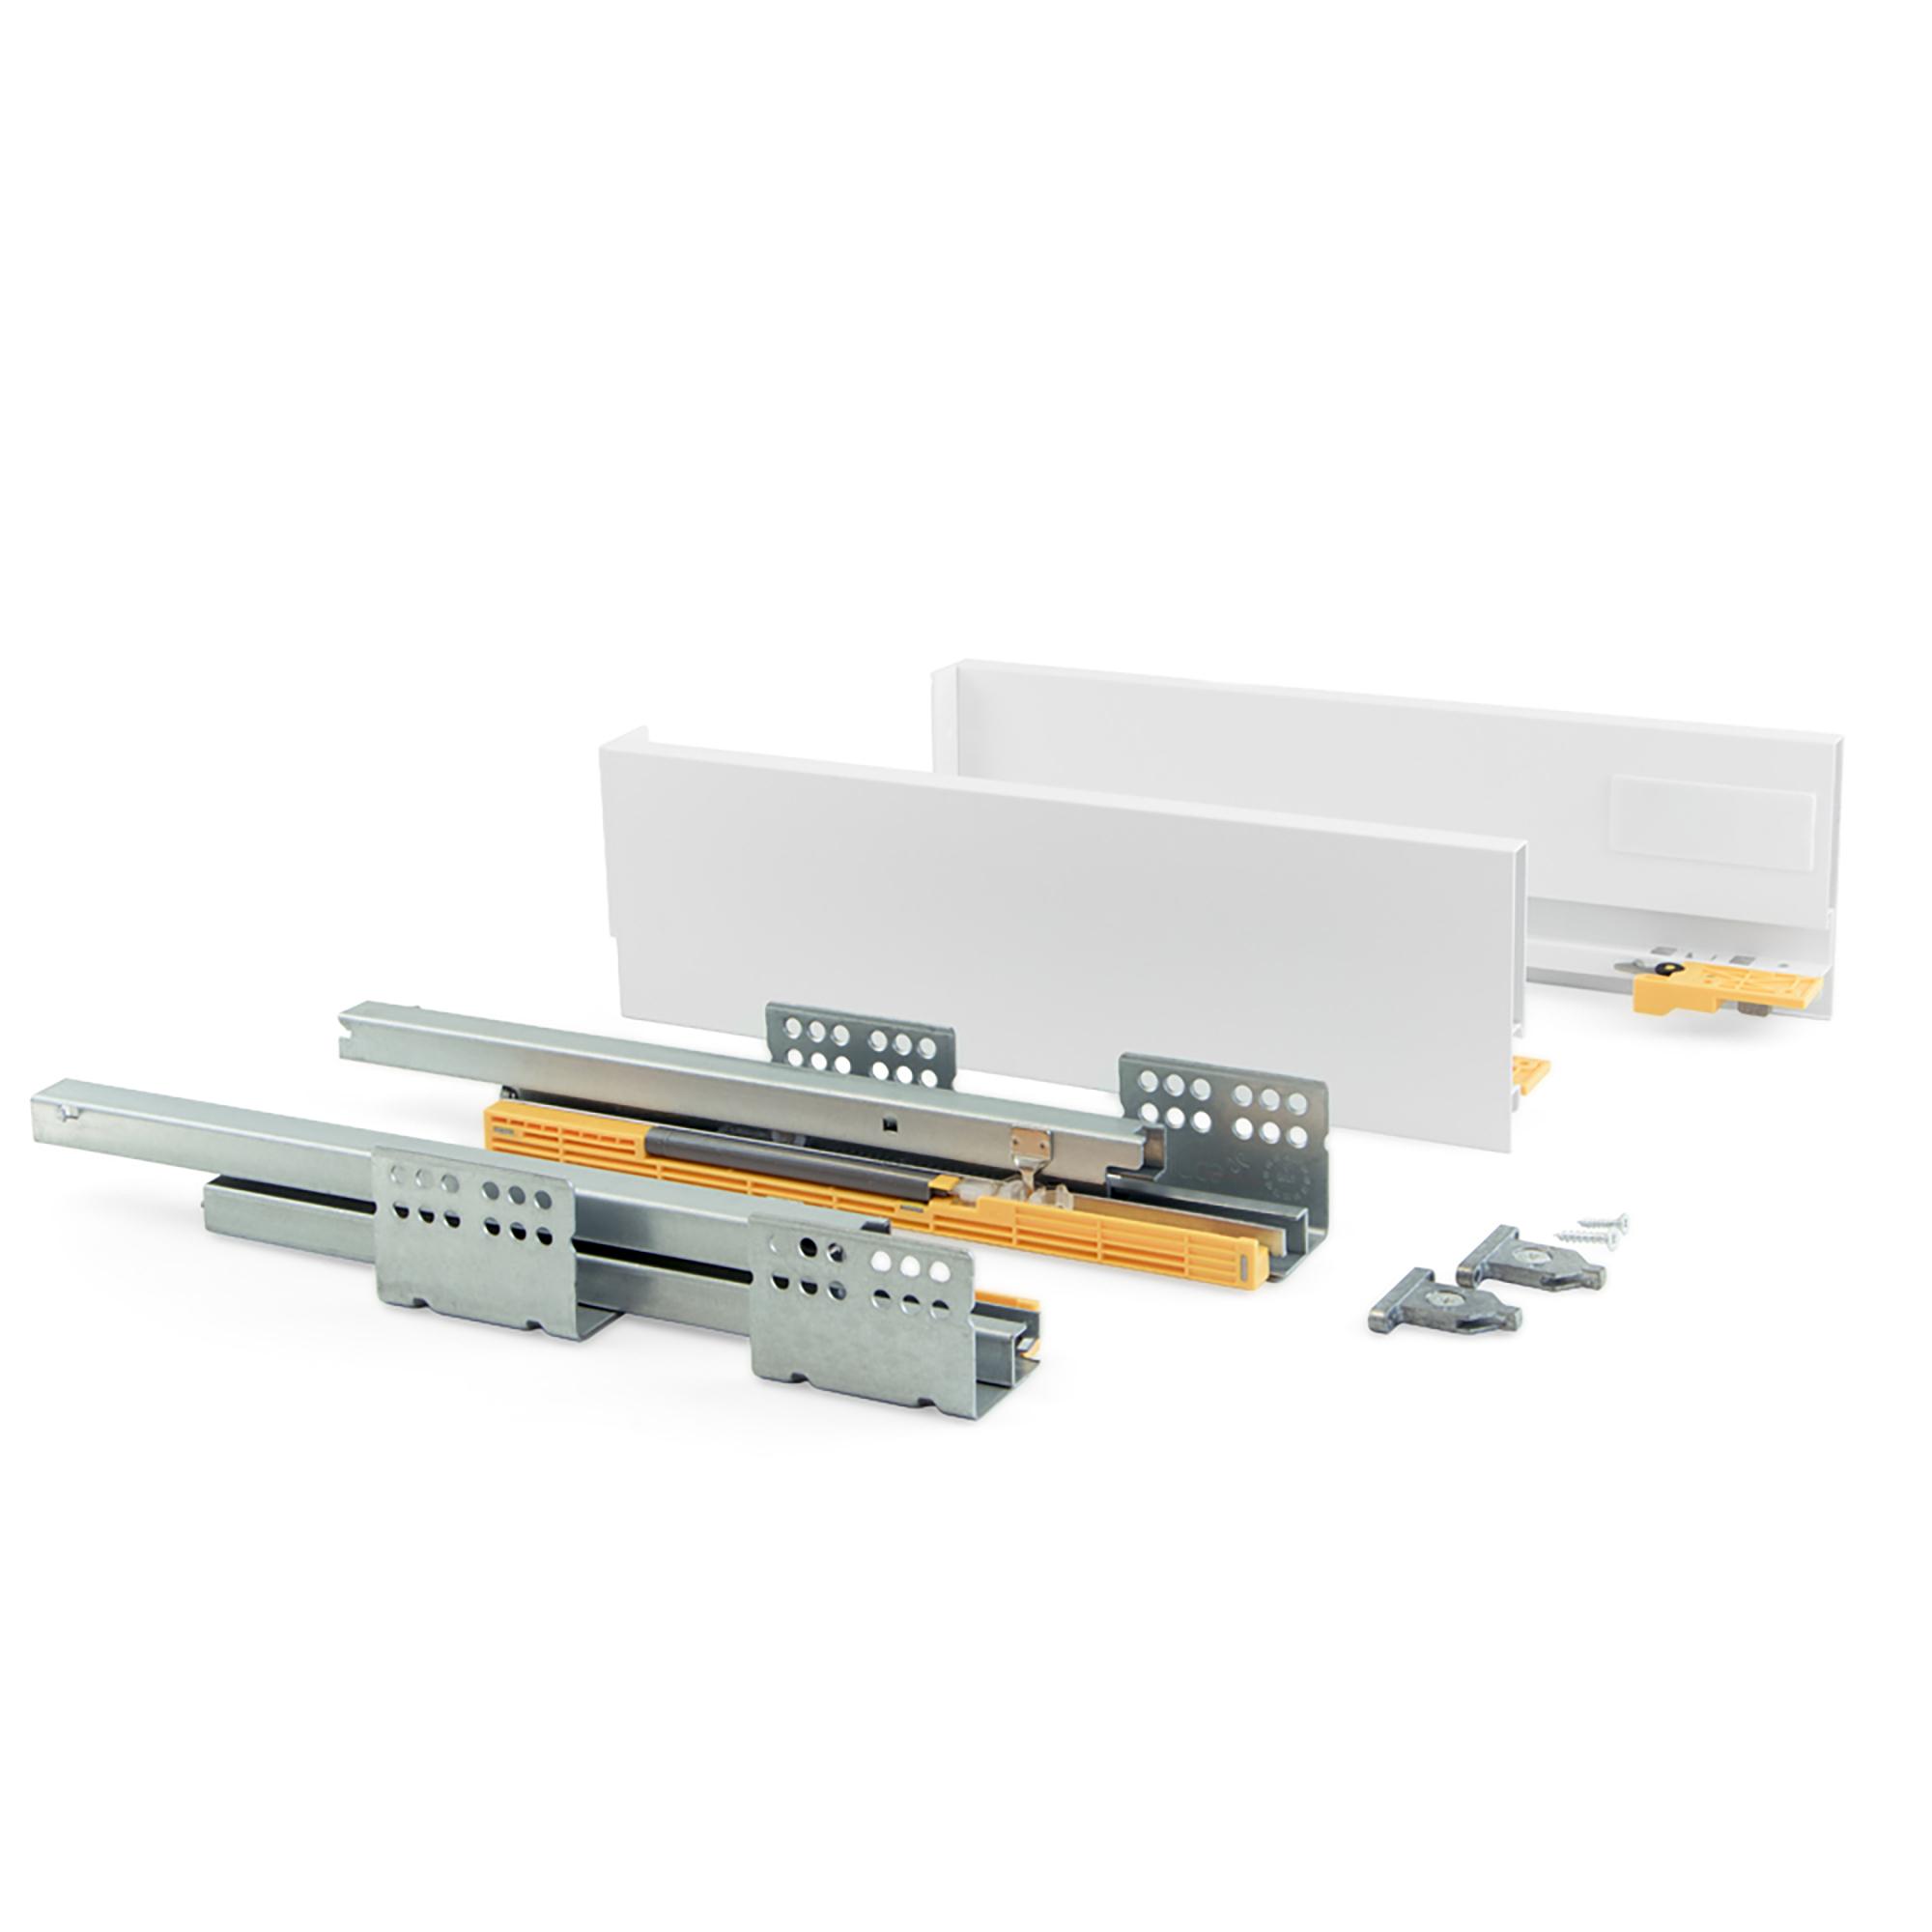 Emuca Kit cassetto per cucina Concept, altezza 105 mm, prof. 450 mm, chiusura soft, Acciaio, Bianco